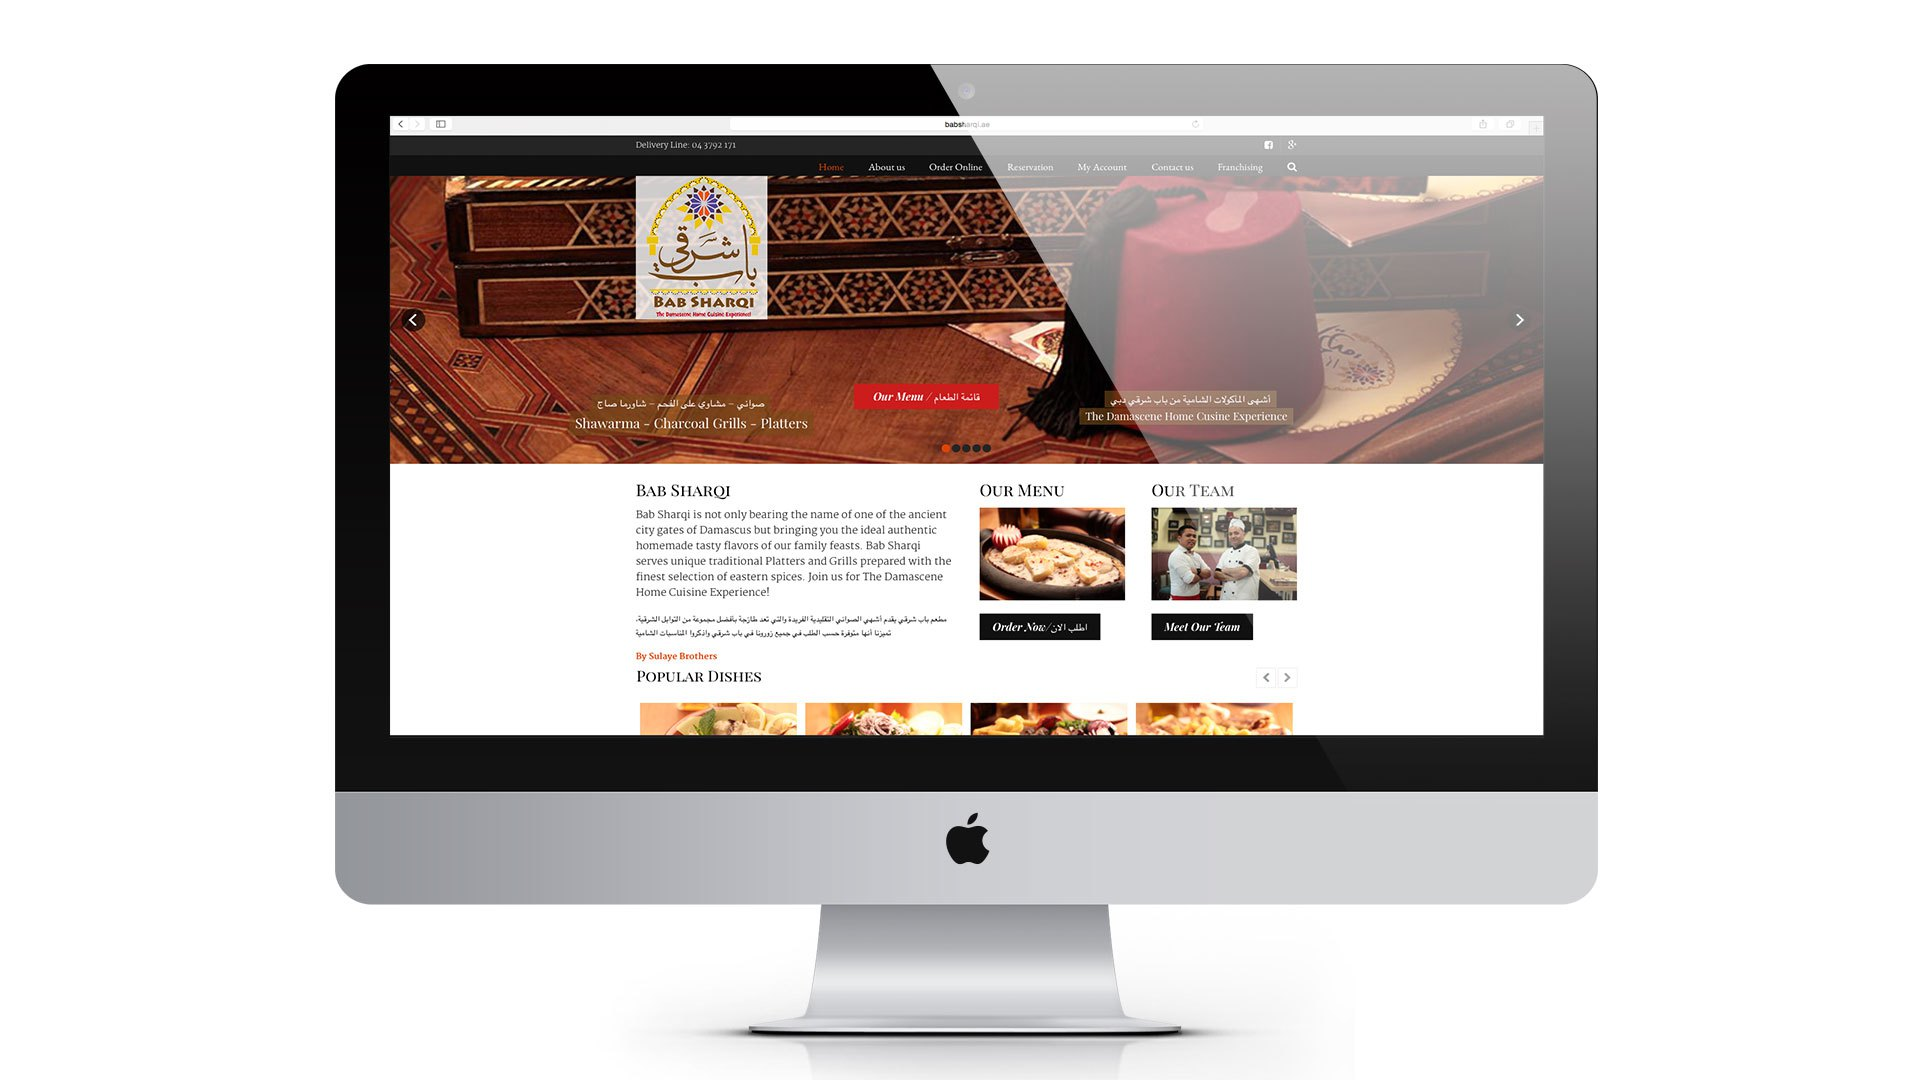 bab-sharqi-website-home-page